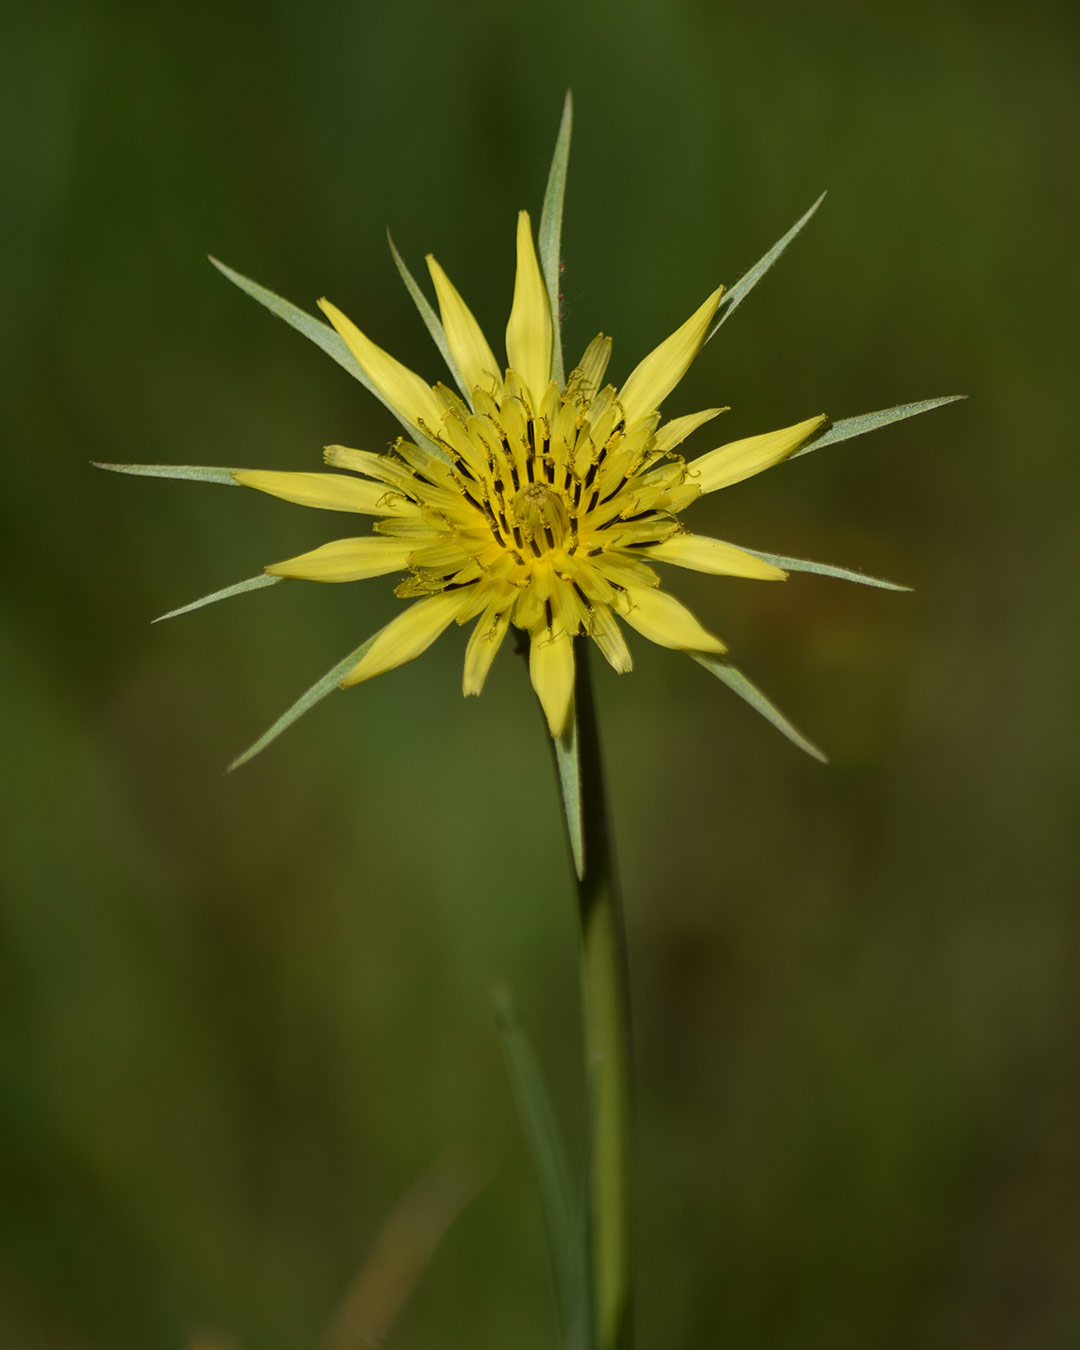 Yellow Salsify (7/17/19) © Jared Manninen